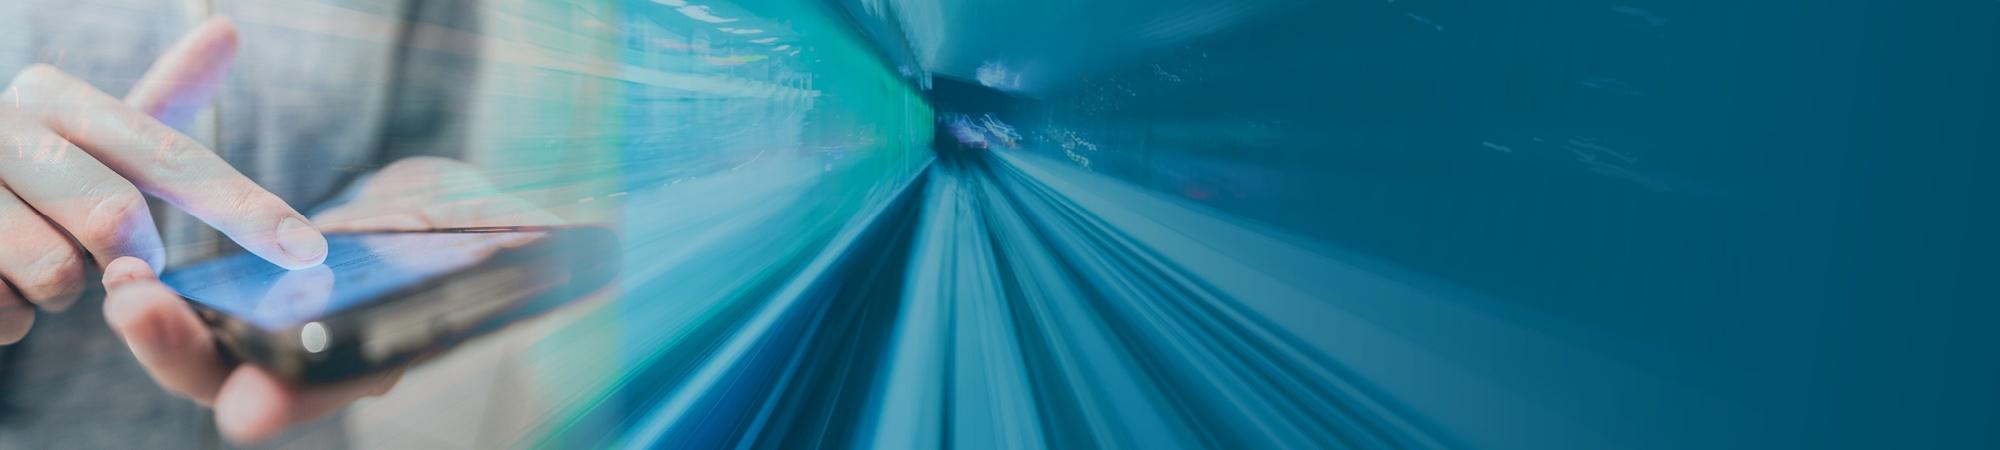 tech_moving_fastpace1-1.jpg